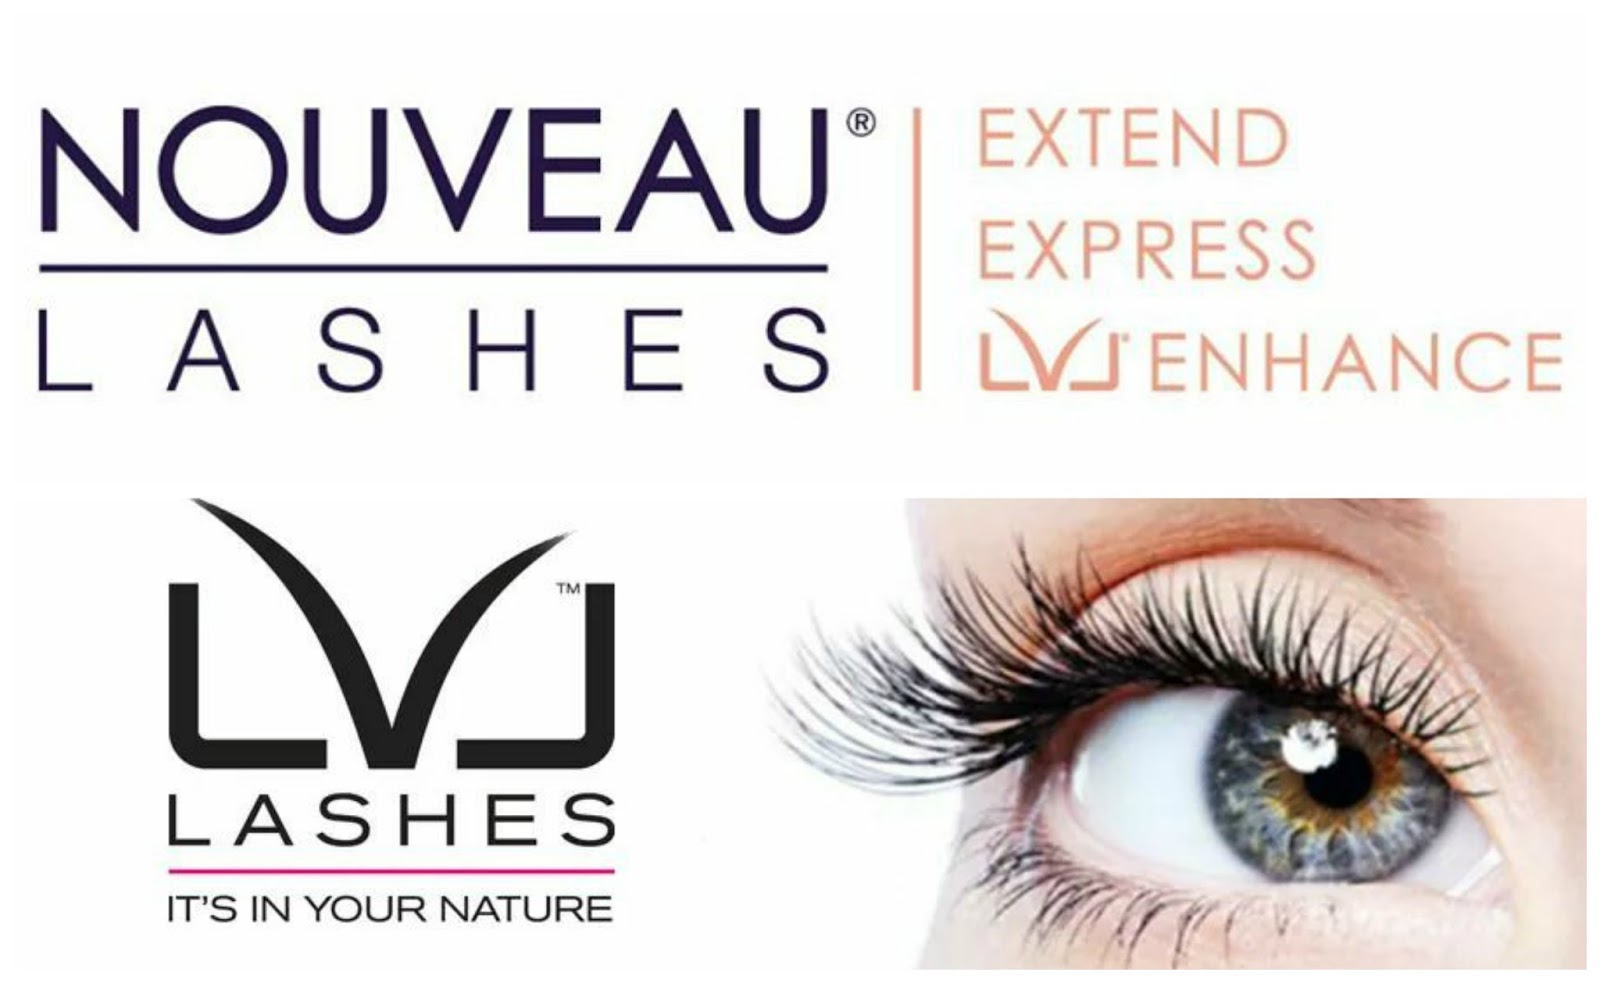 Lvl Lash Treatment At Nouveau Lashes Malta Every Beauty Addicts Bible